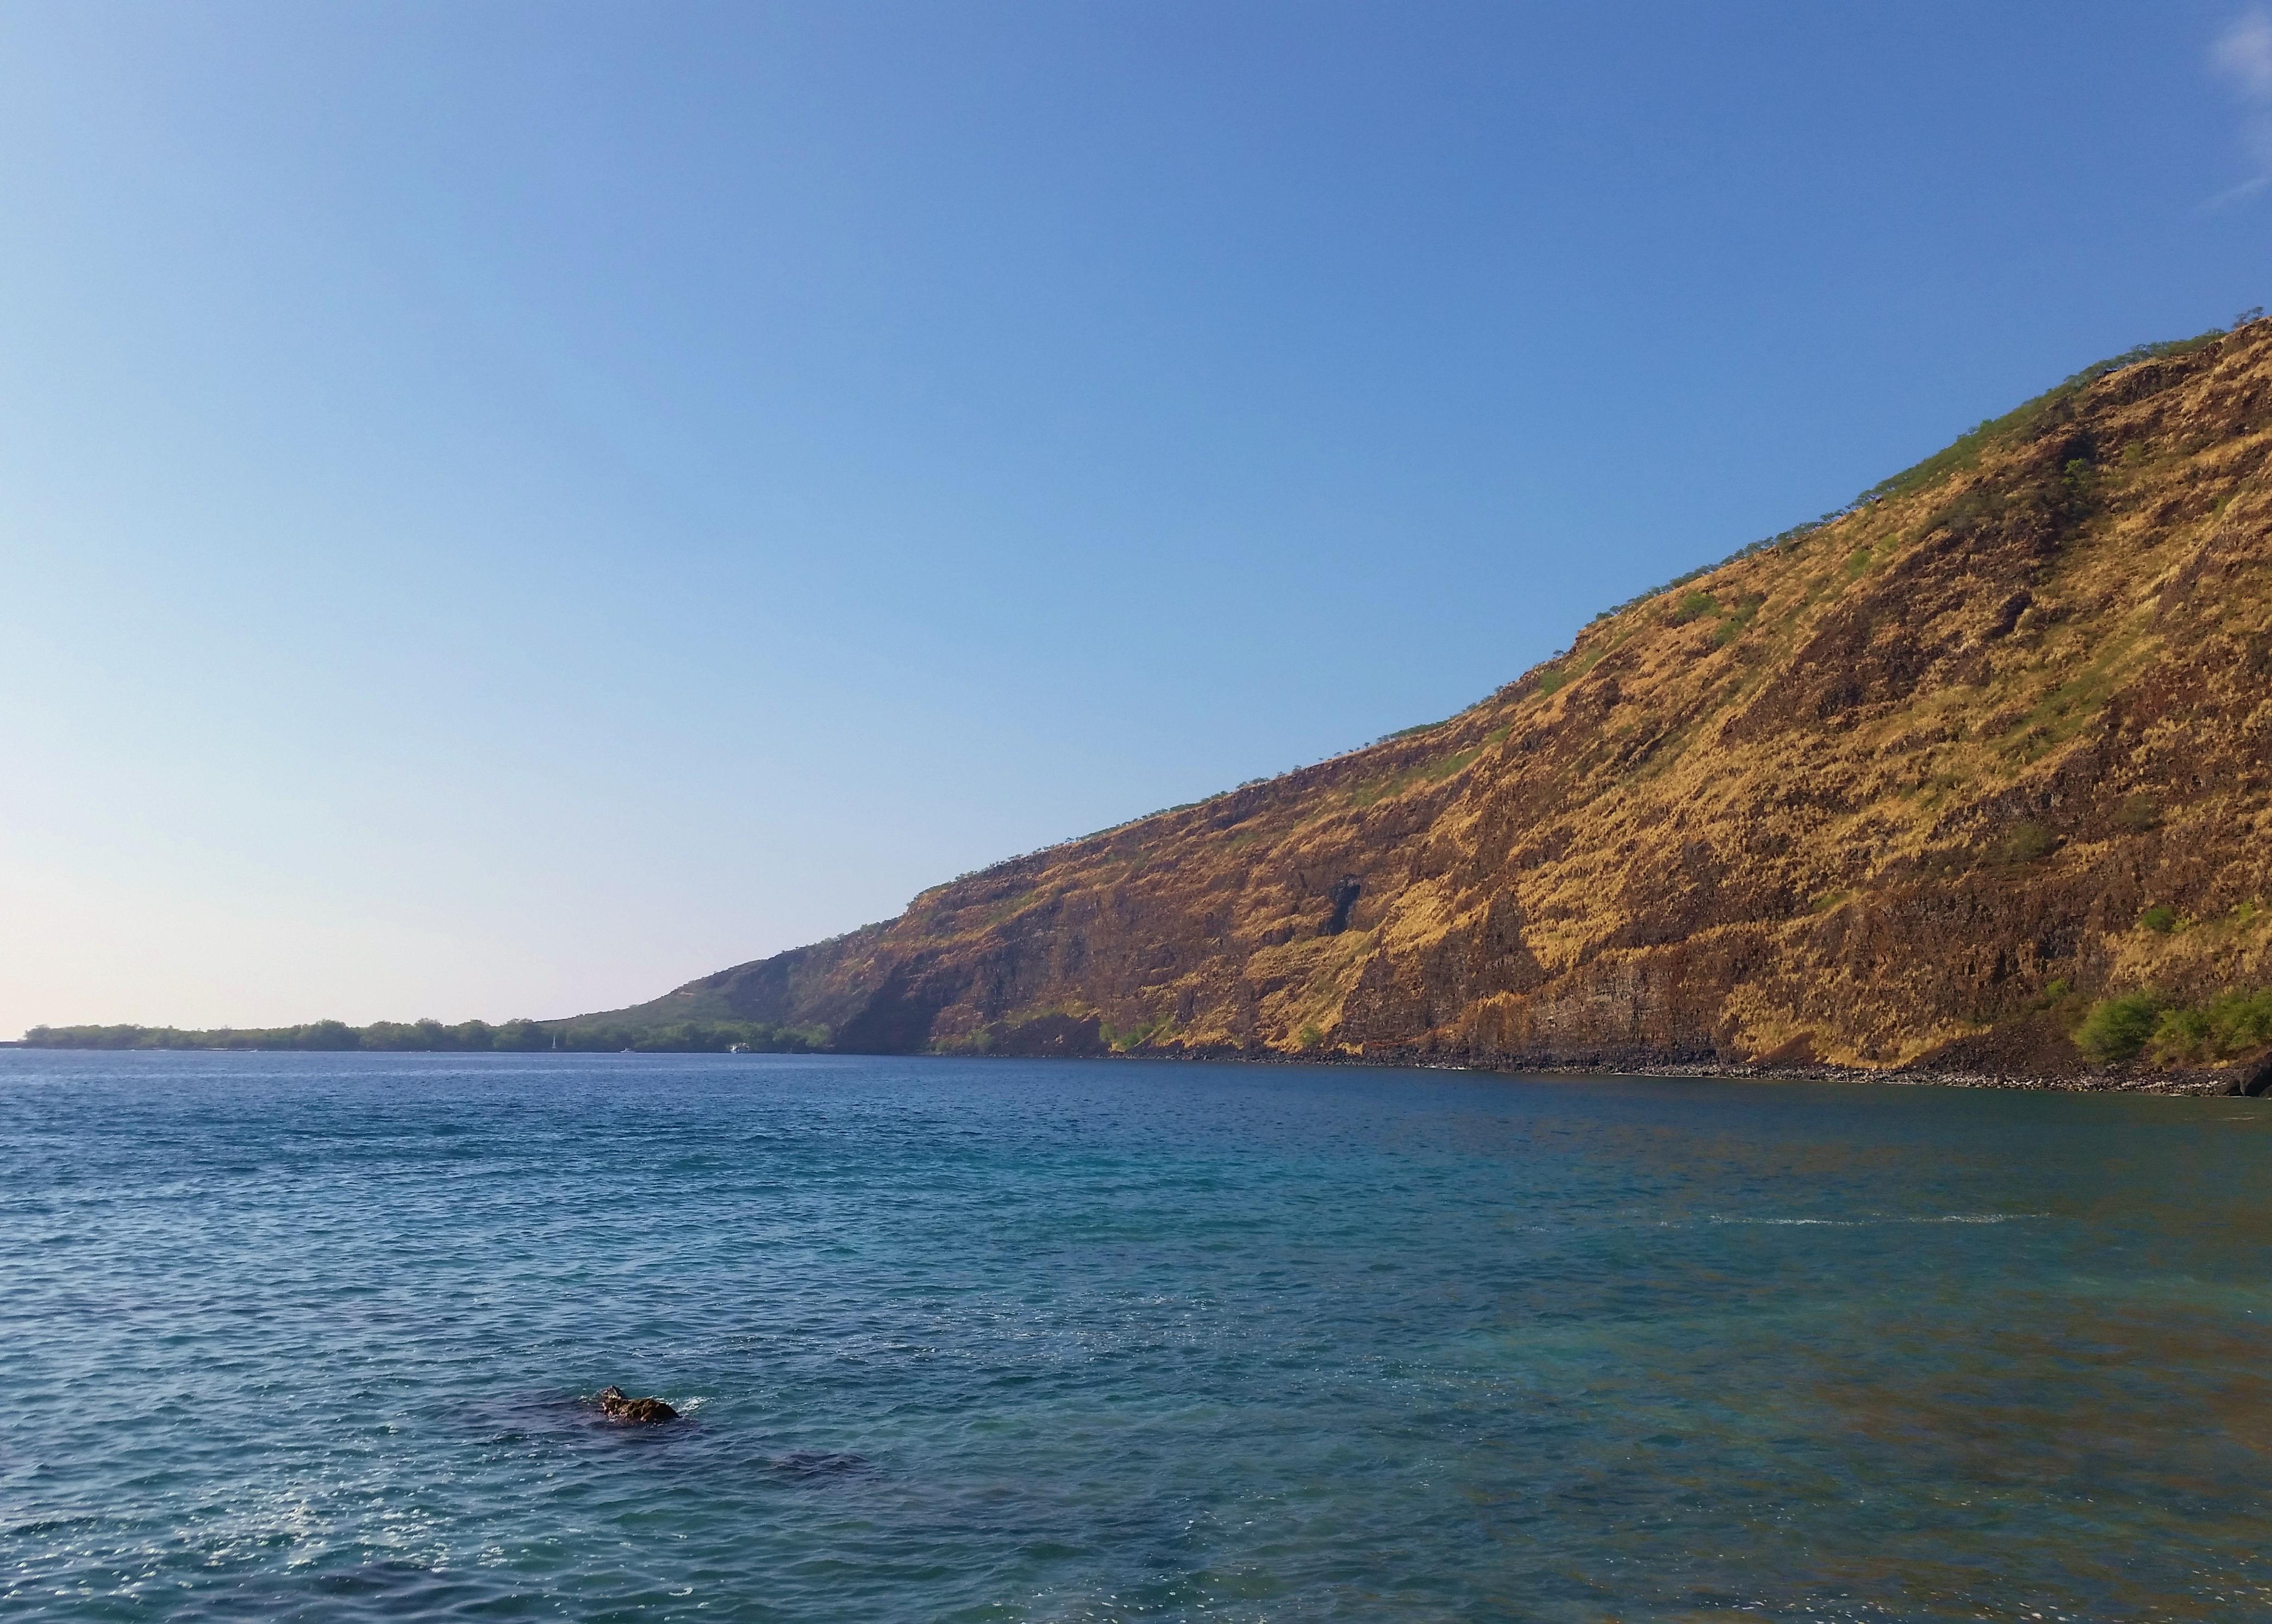 Kealakekua_Bay_–_Captain_Cook_volcano_mountain_retreat_b&b_big_island_hawaii